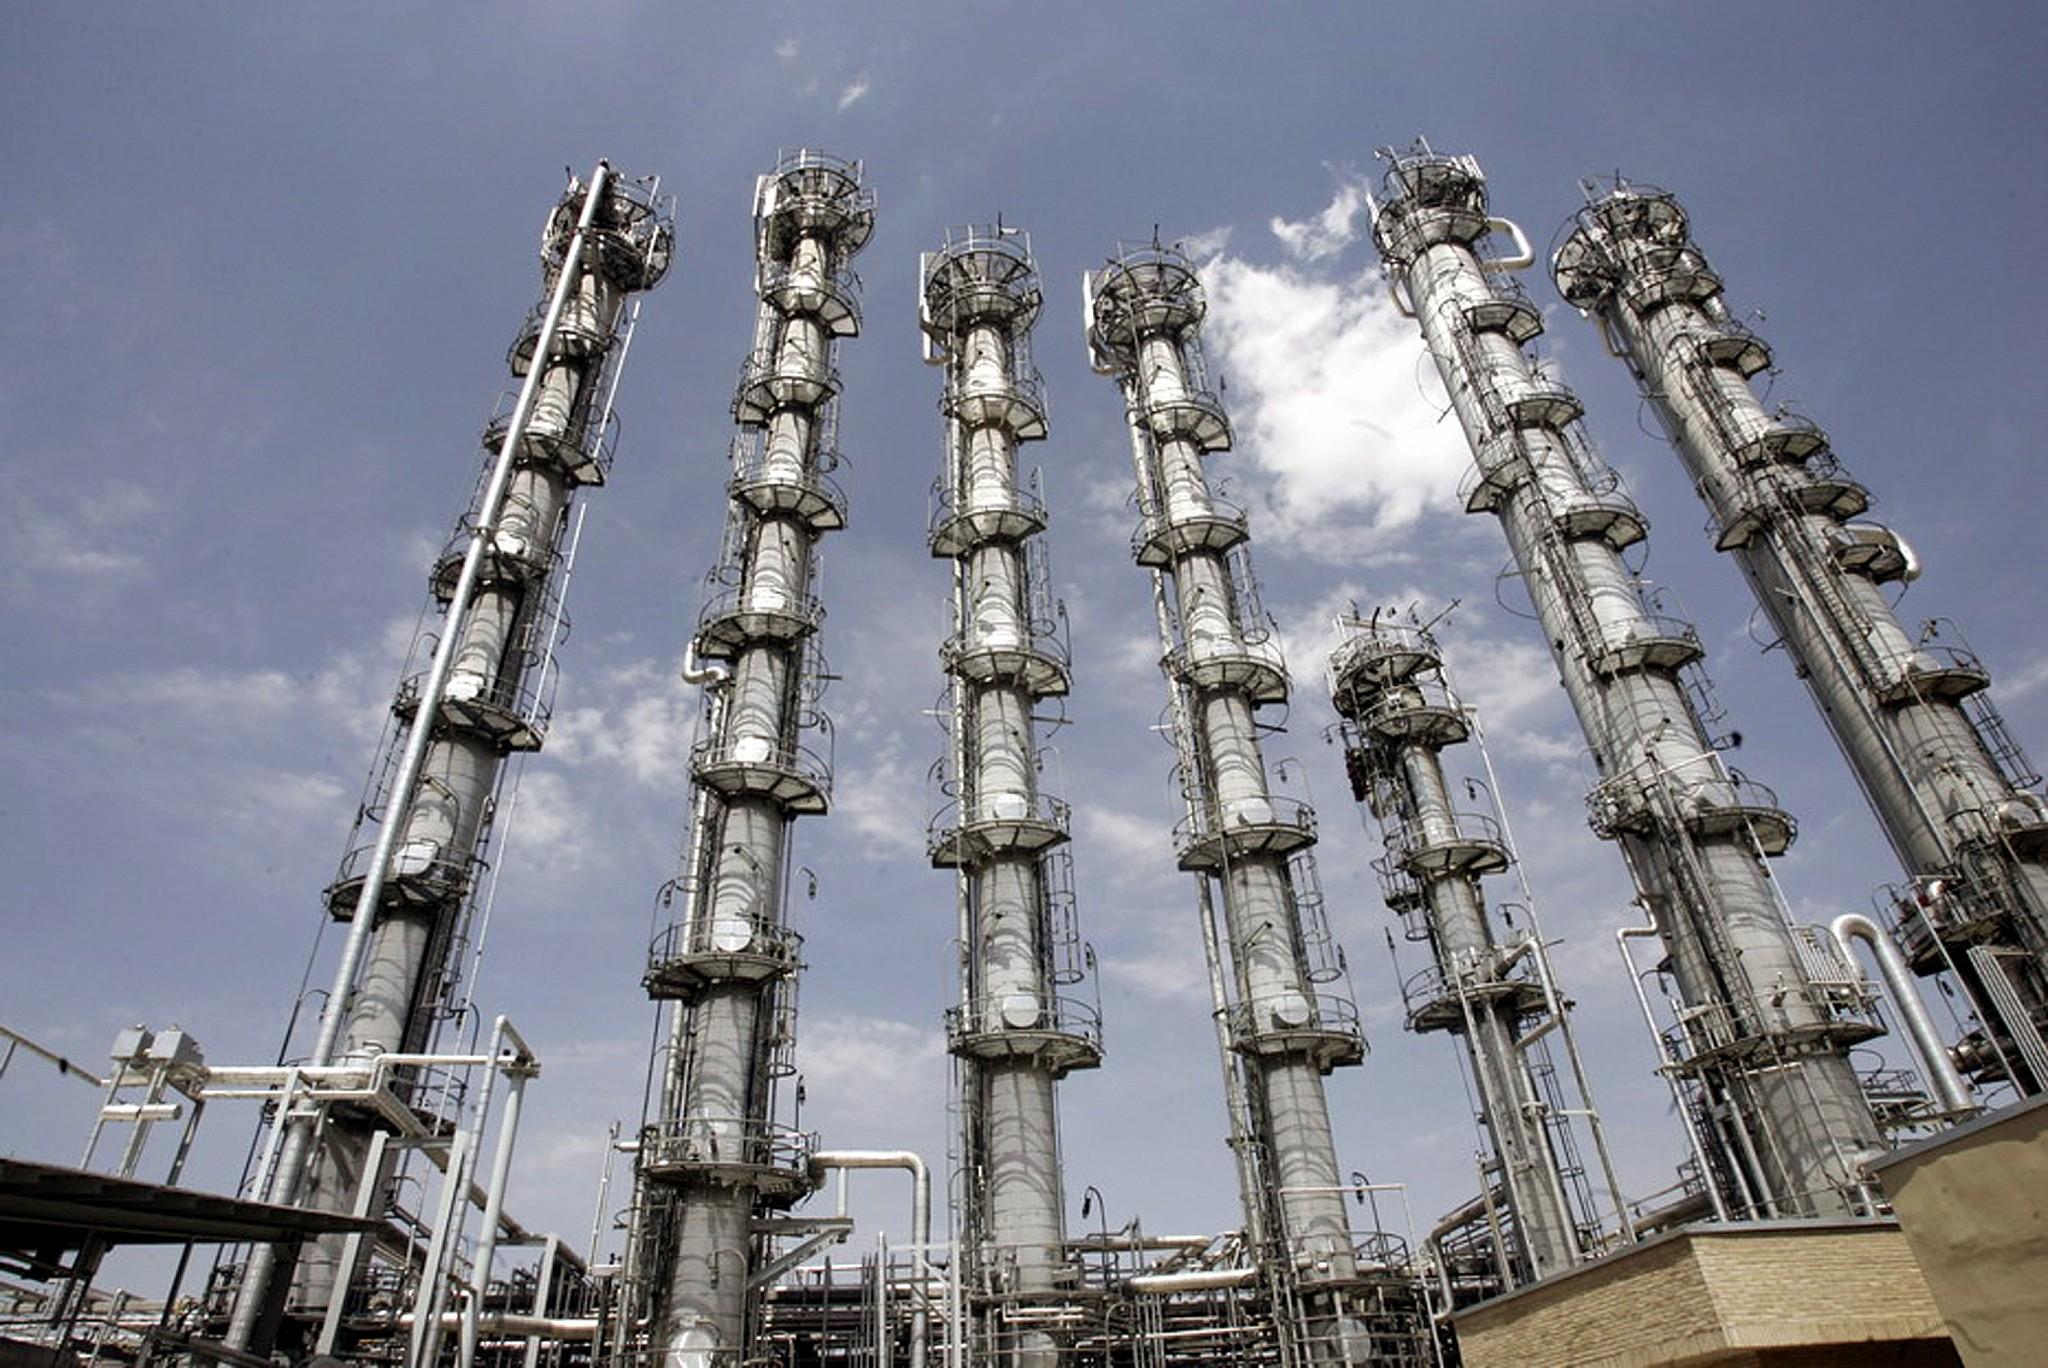 U.S. Renews Sanctions On Iran's Nuclear Program Despite International Calls